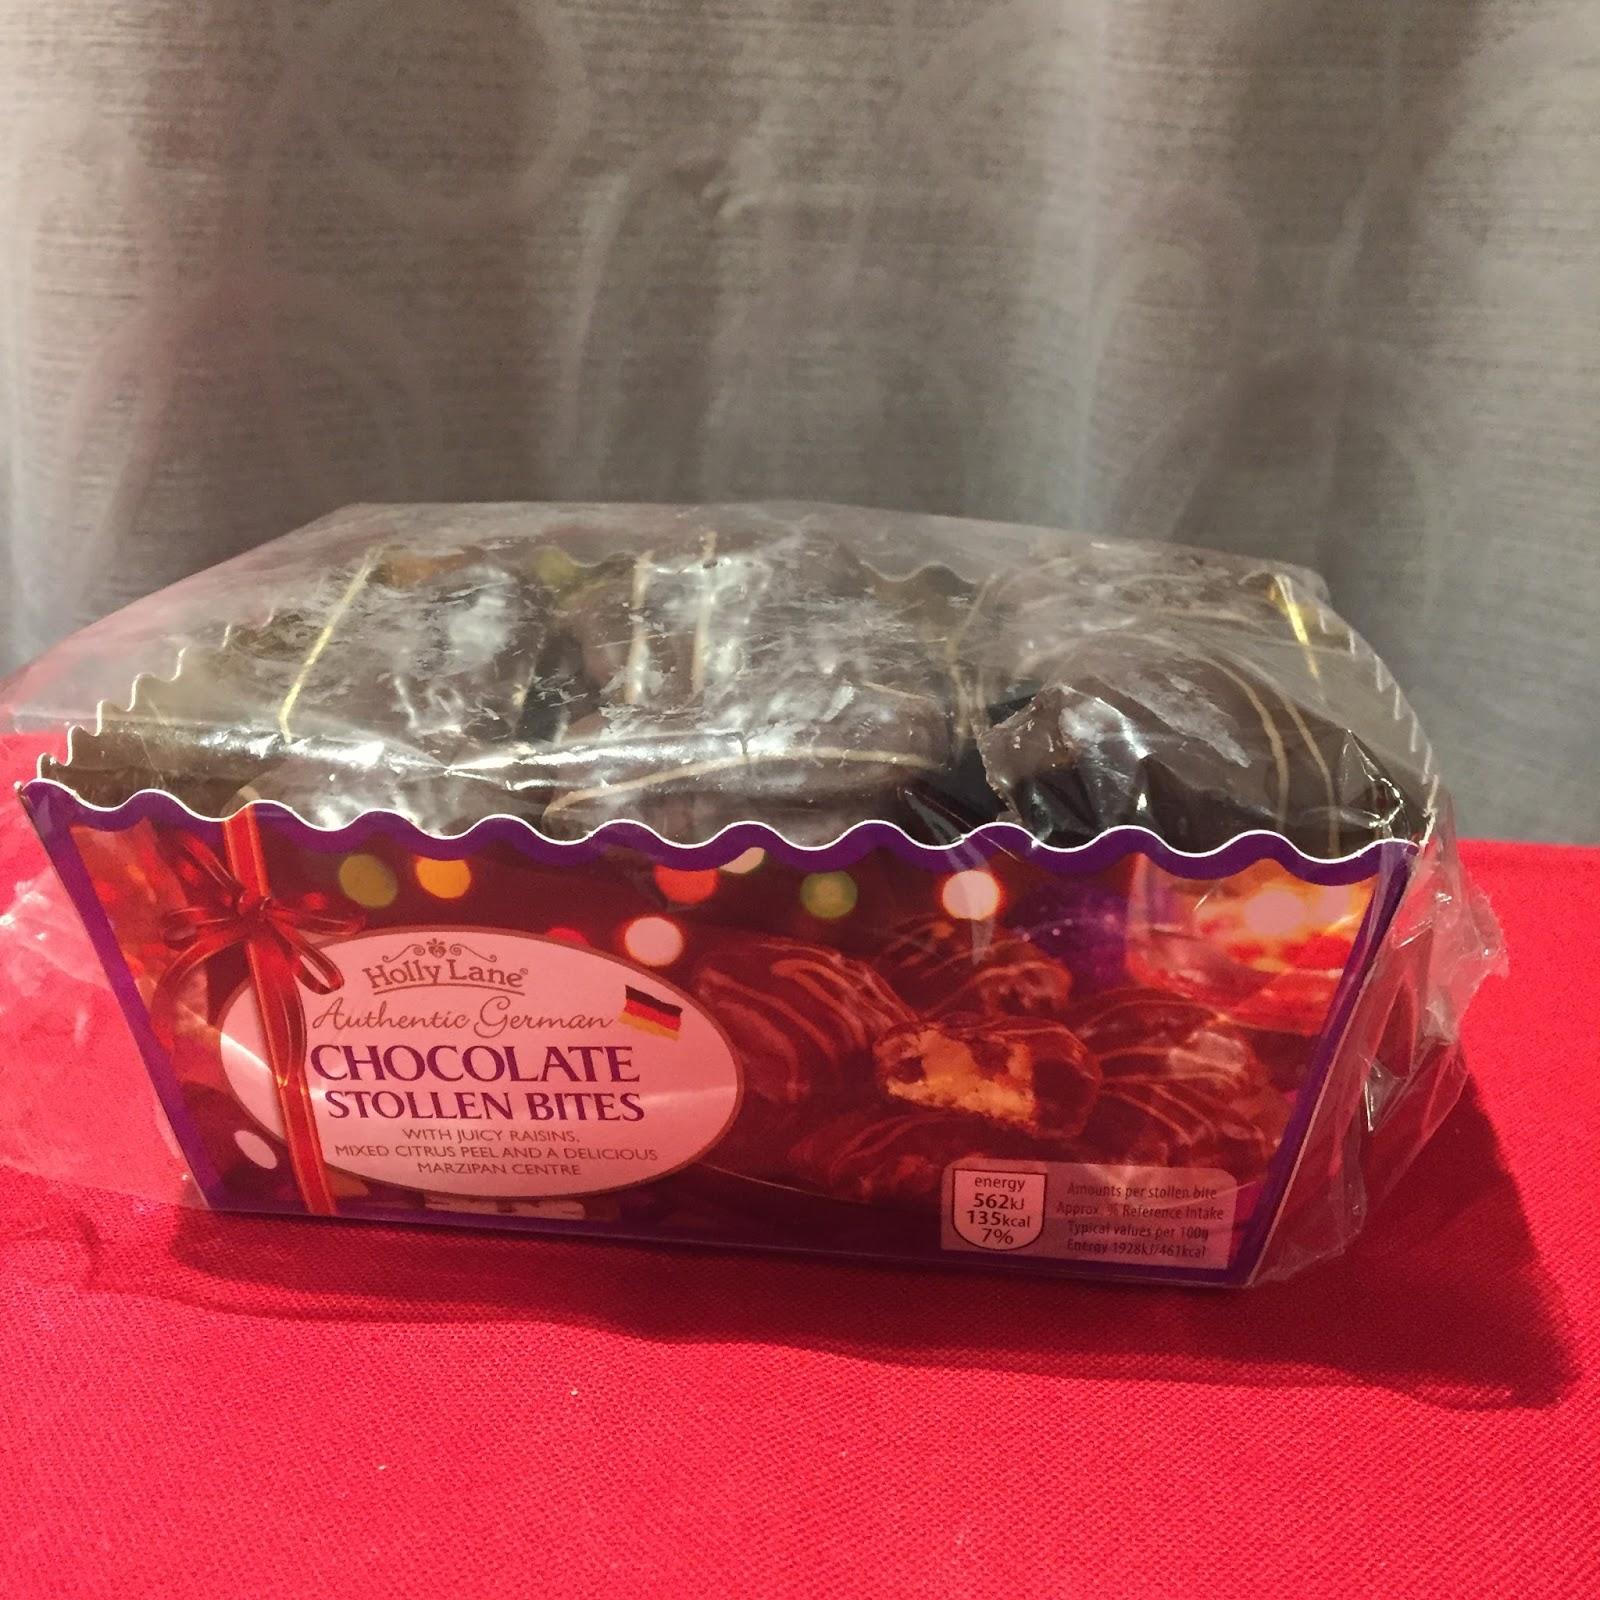 Amy Seeks New Treats: NEW! Holly Lane Chocolate Stollen Bites (ALDI)